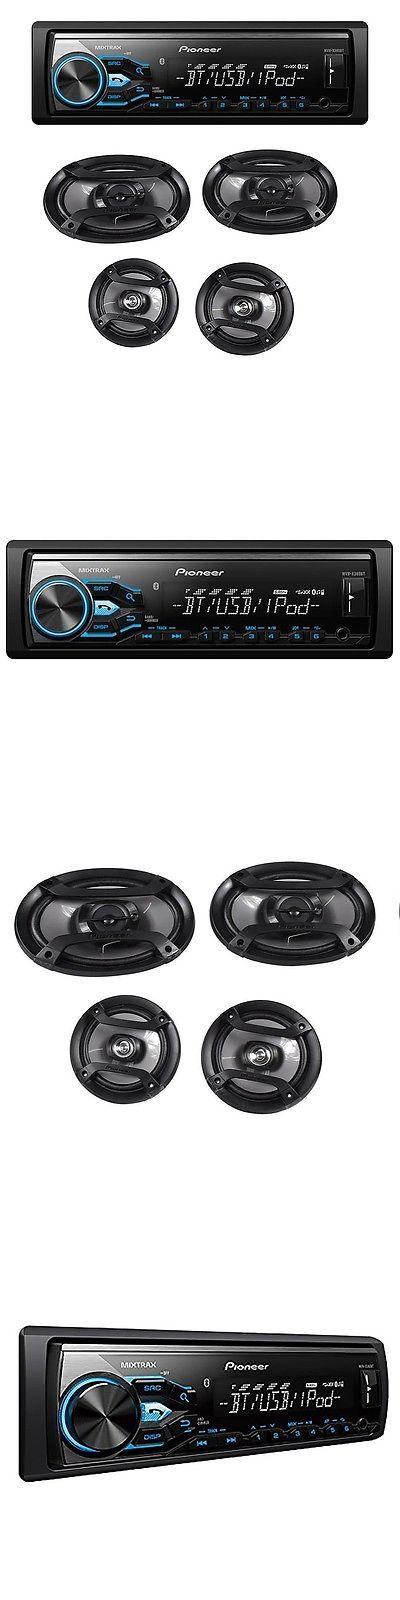 Car Audio In-Dash Units: Pioneer Mxt-X3869bt Bluetooth In-Dash Digital Media Receiver System W Speakers -> BUY IT NOW ONLY: $93.95 on eBay!